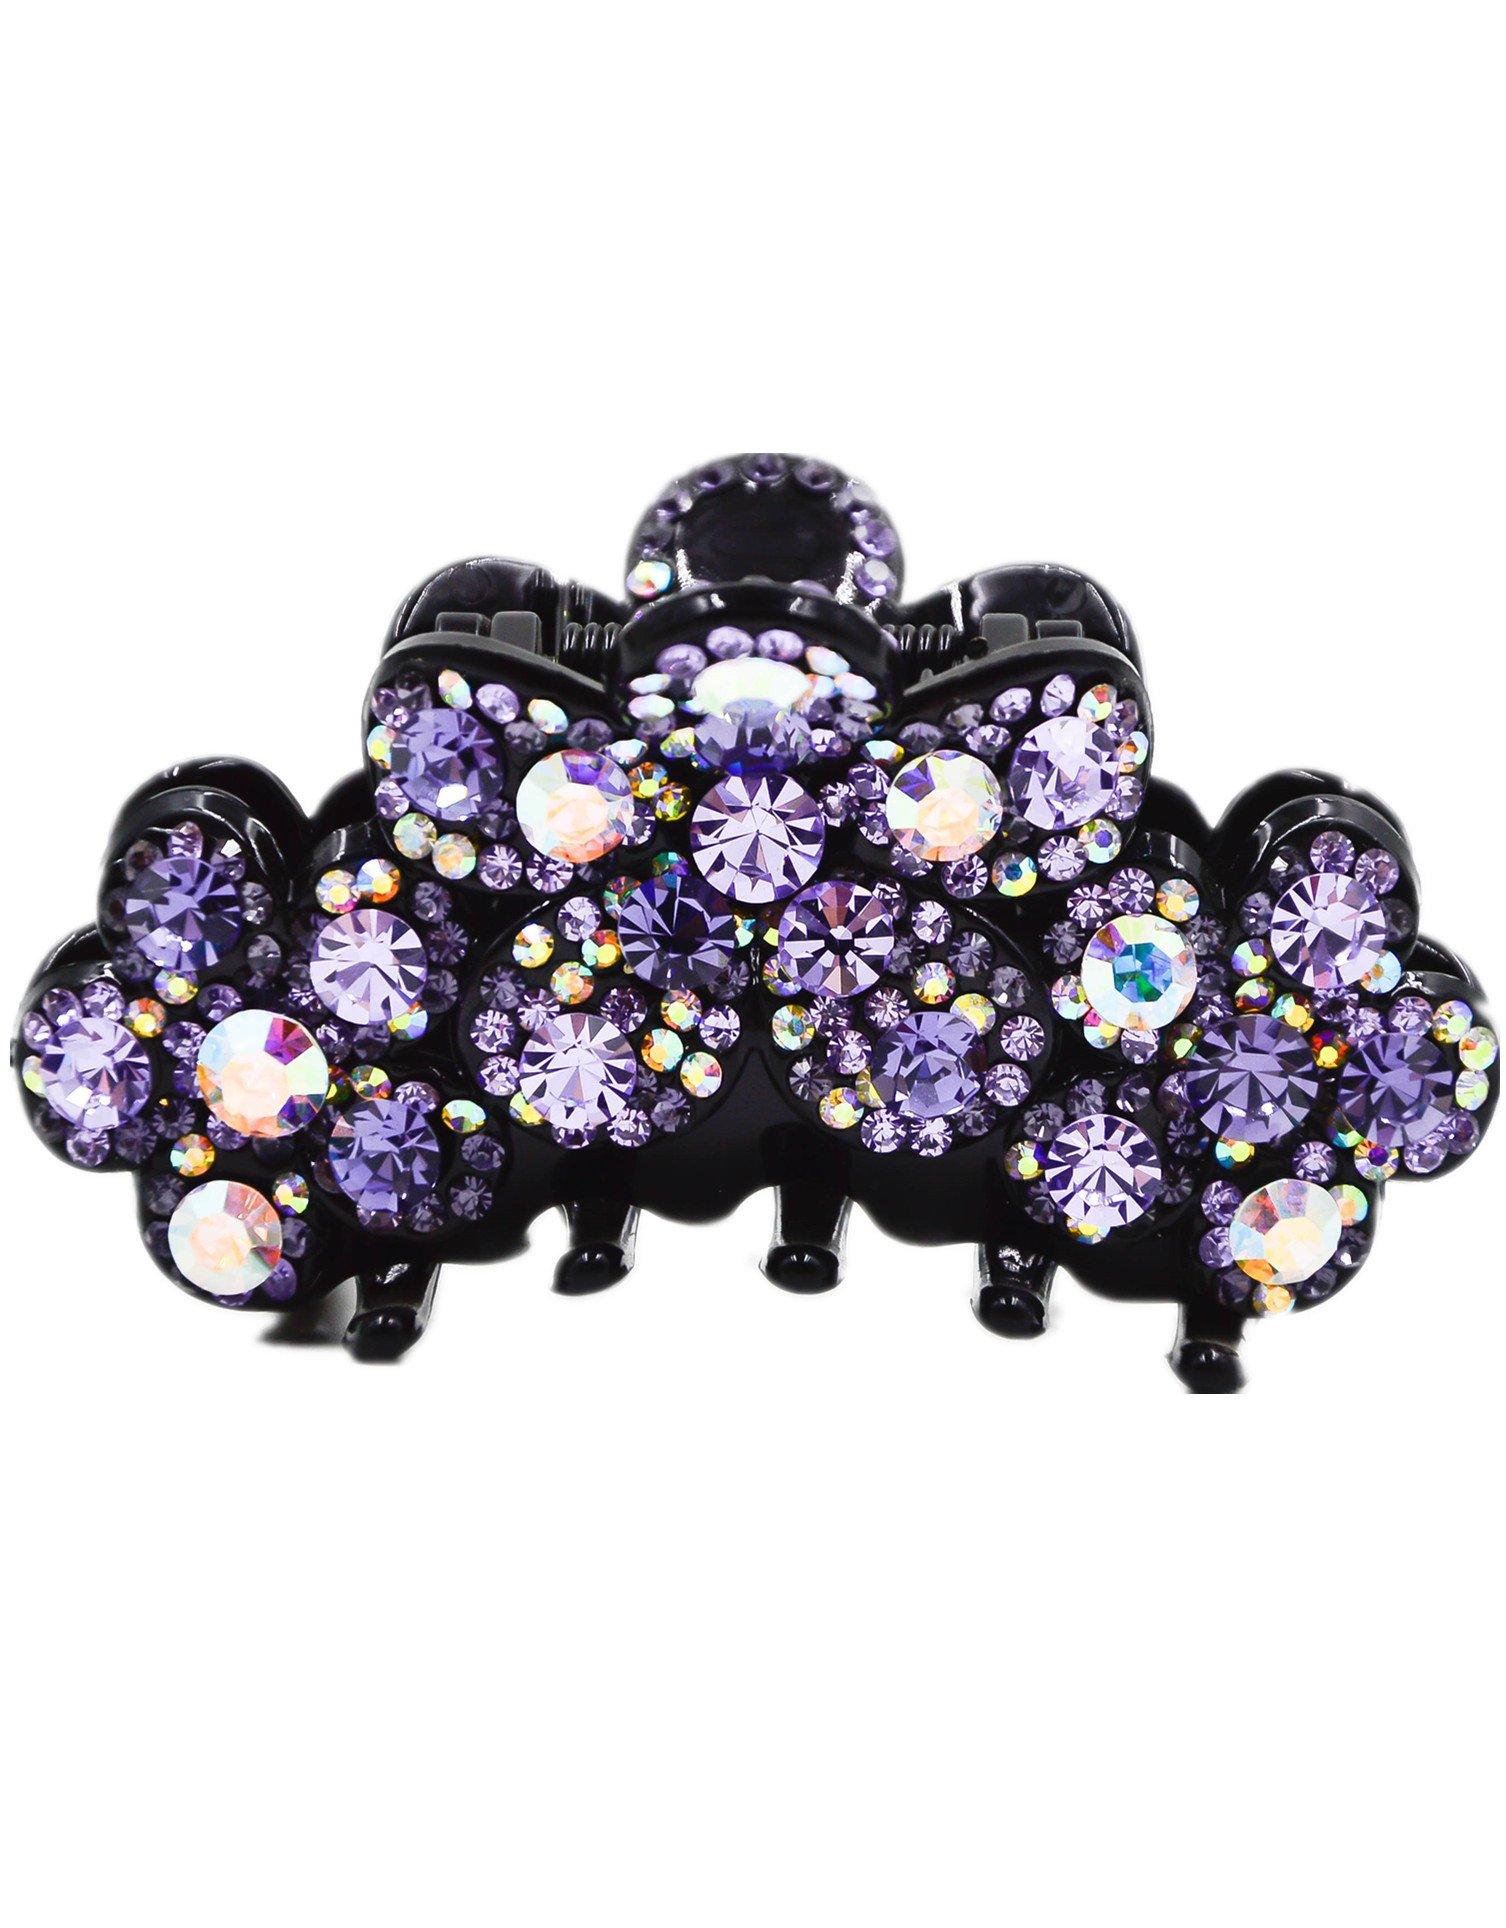 Fancyin New arrival Luxury Purple Crystal colorful rhinestones hair claw clip for women